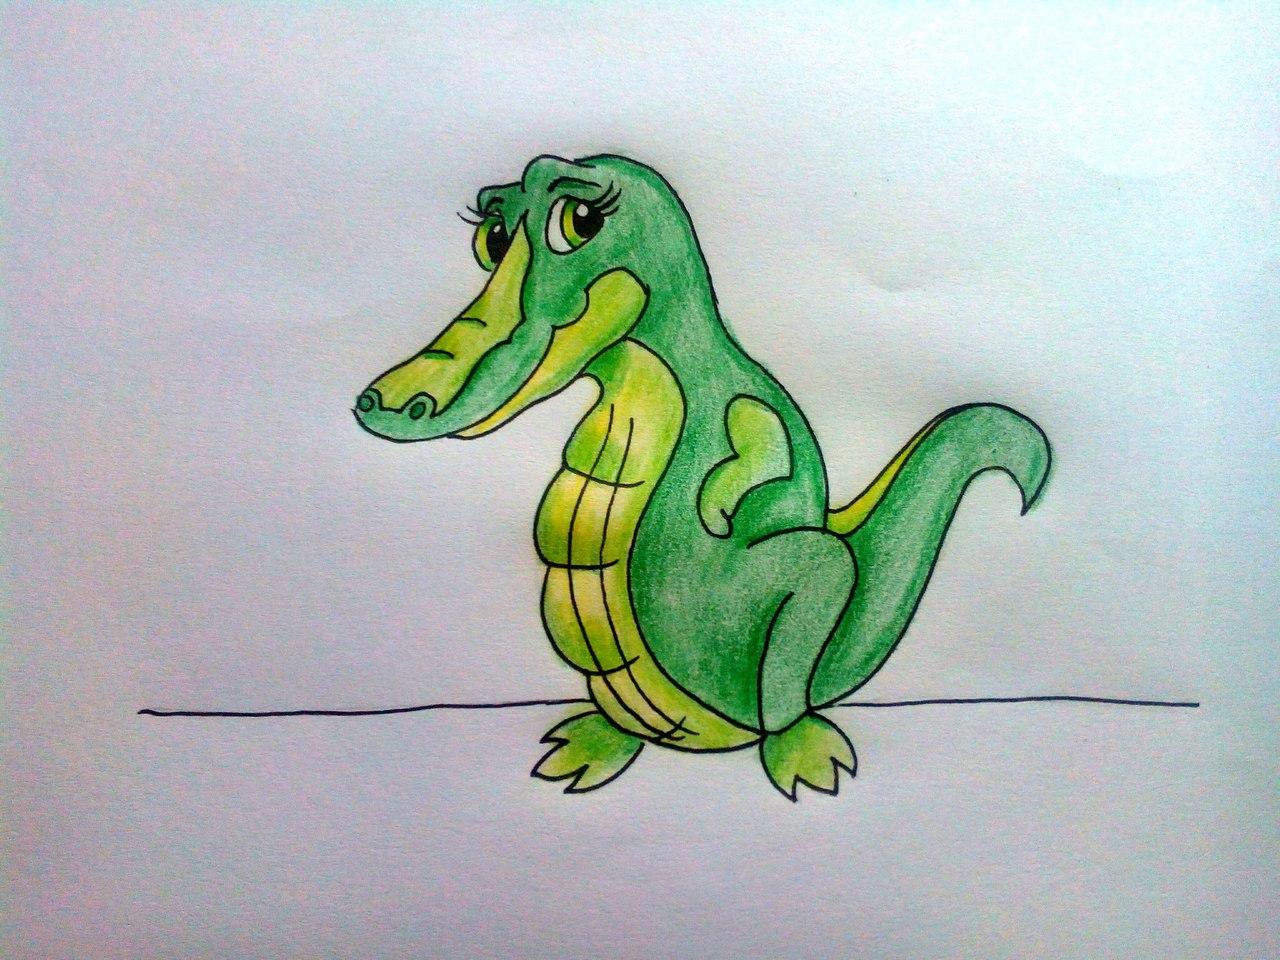 нарисованный крокодил